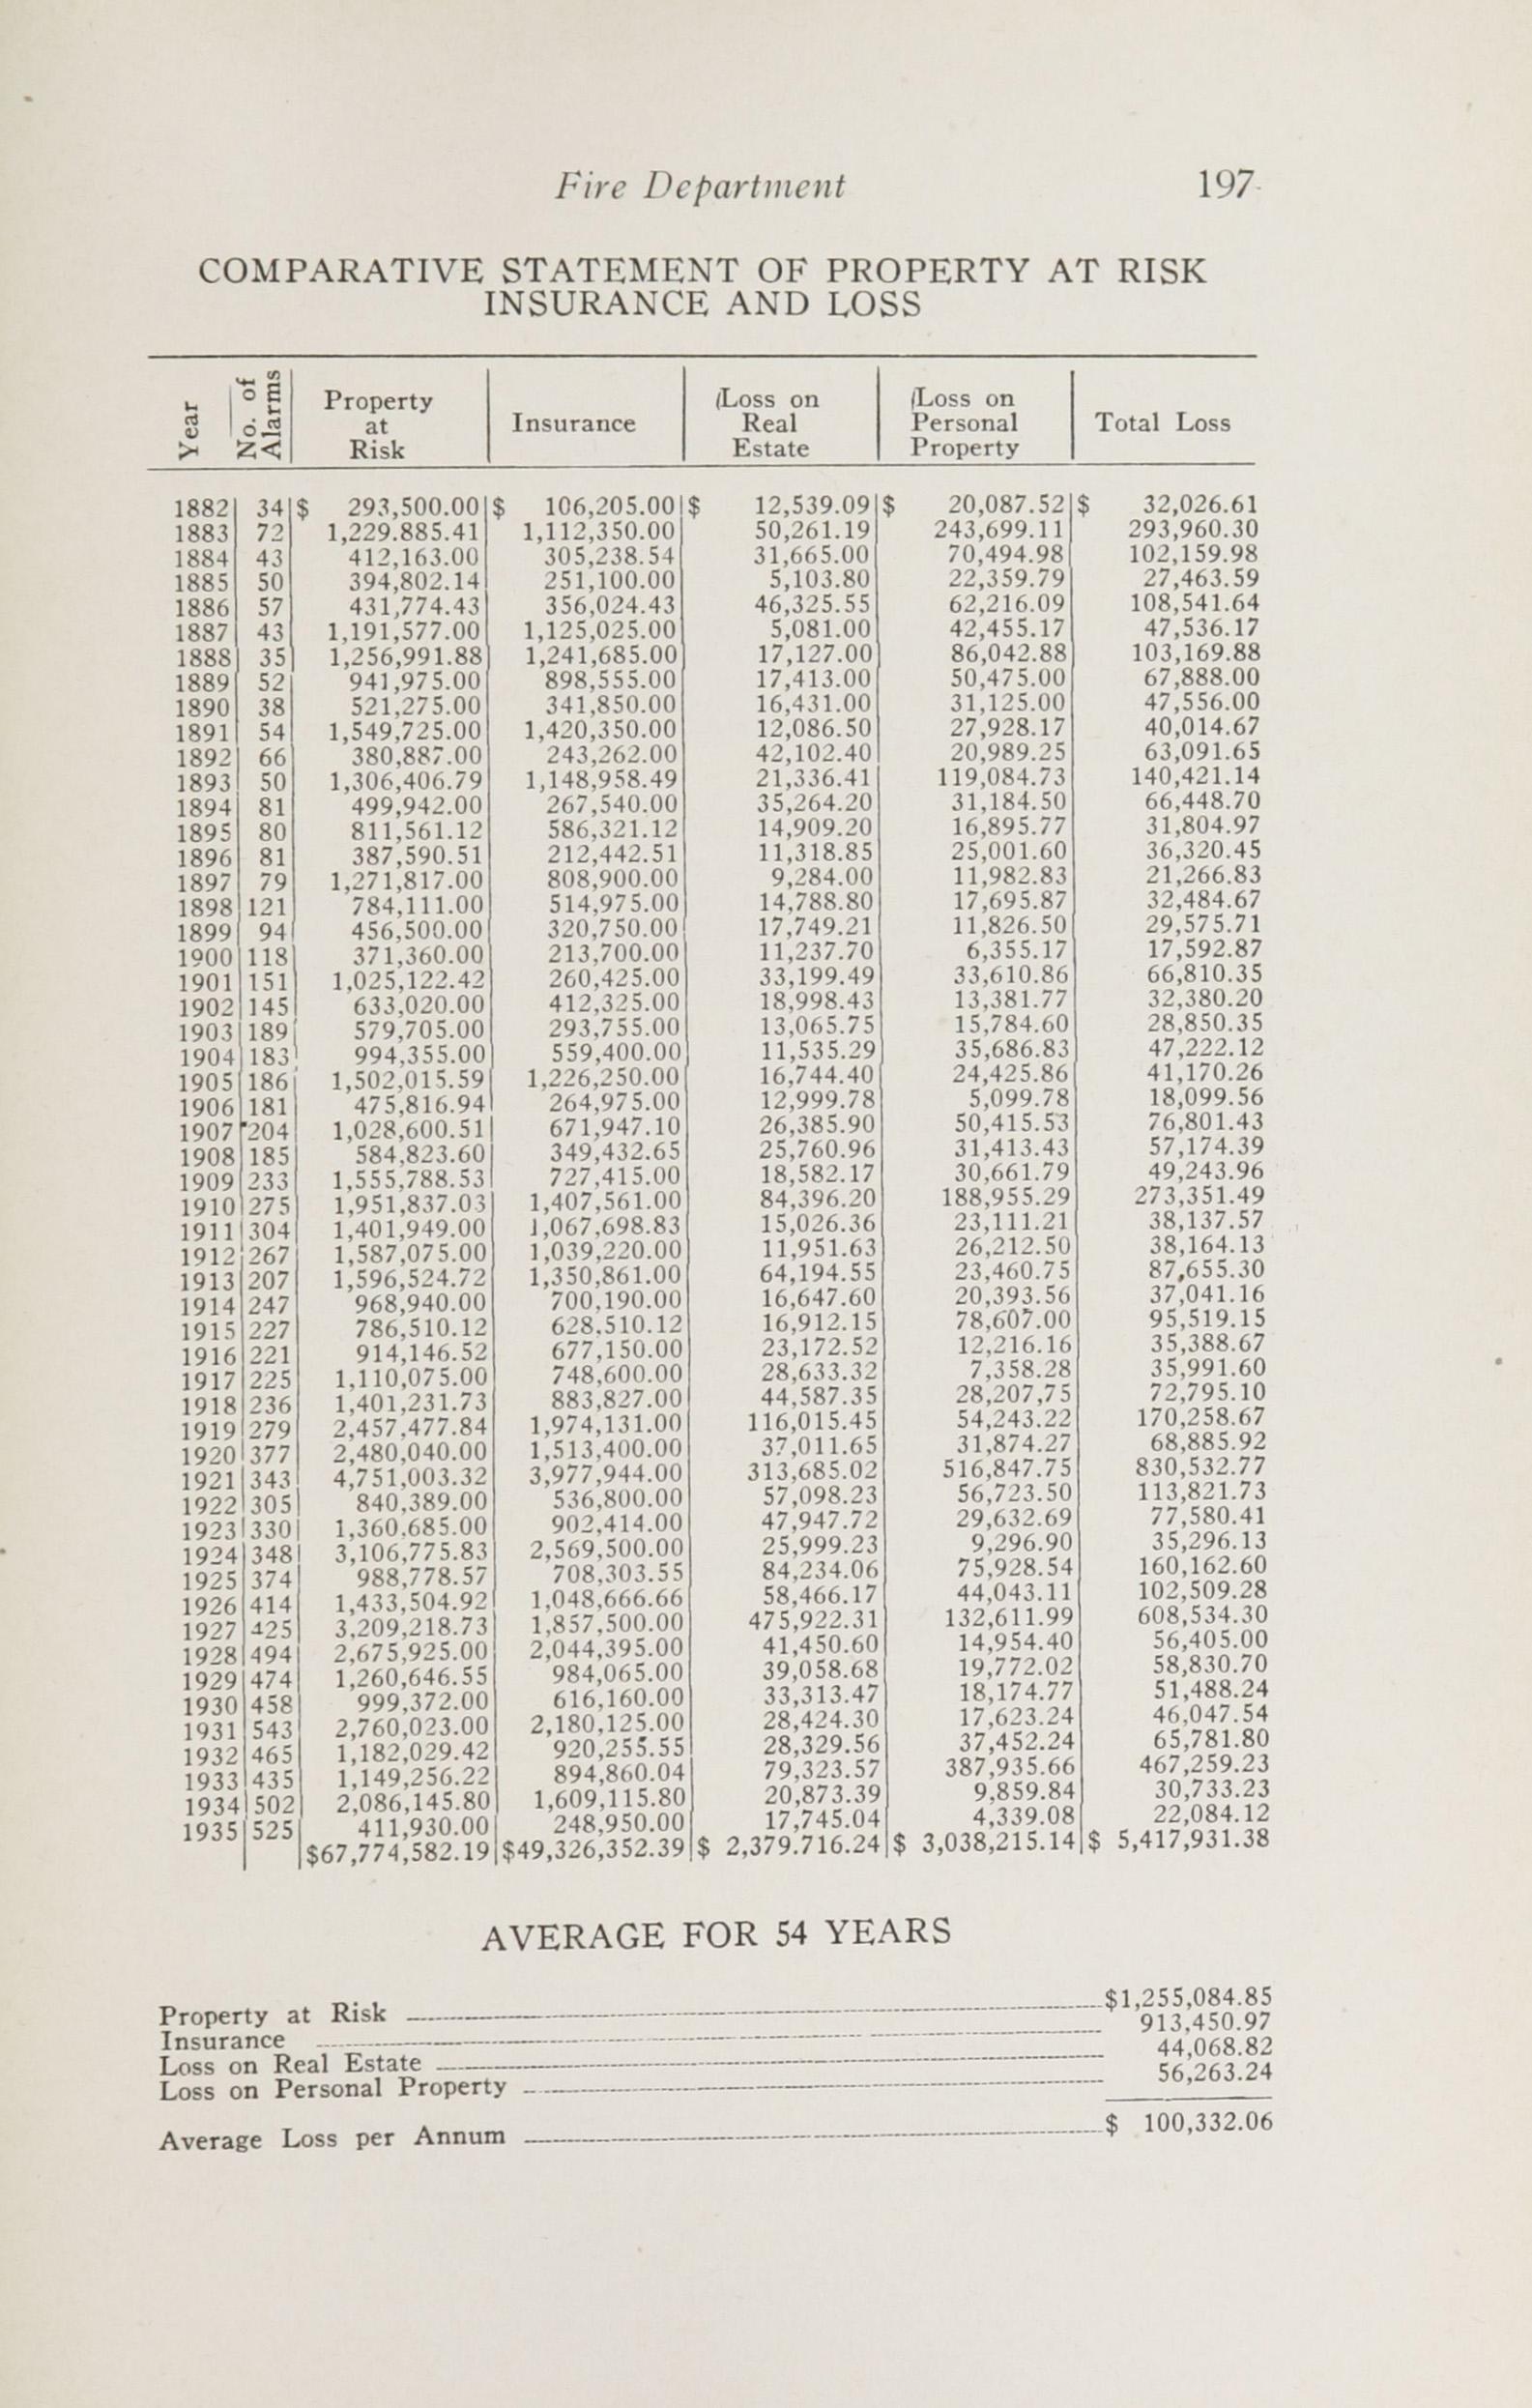 Charleston Yearbook, 1932-1935, page 197